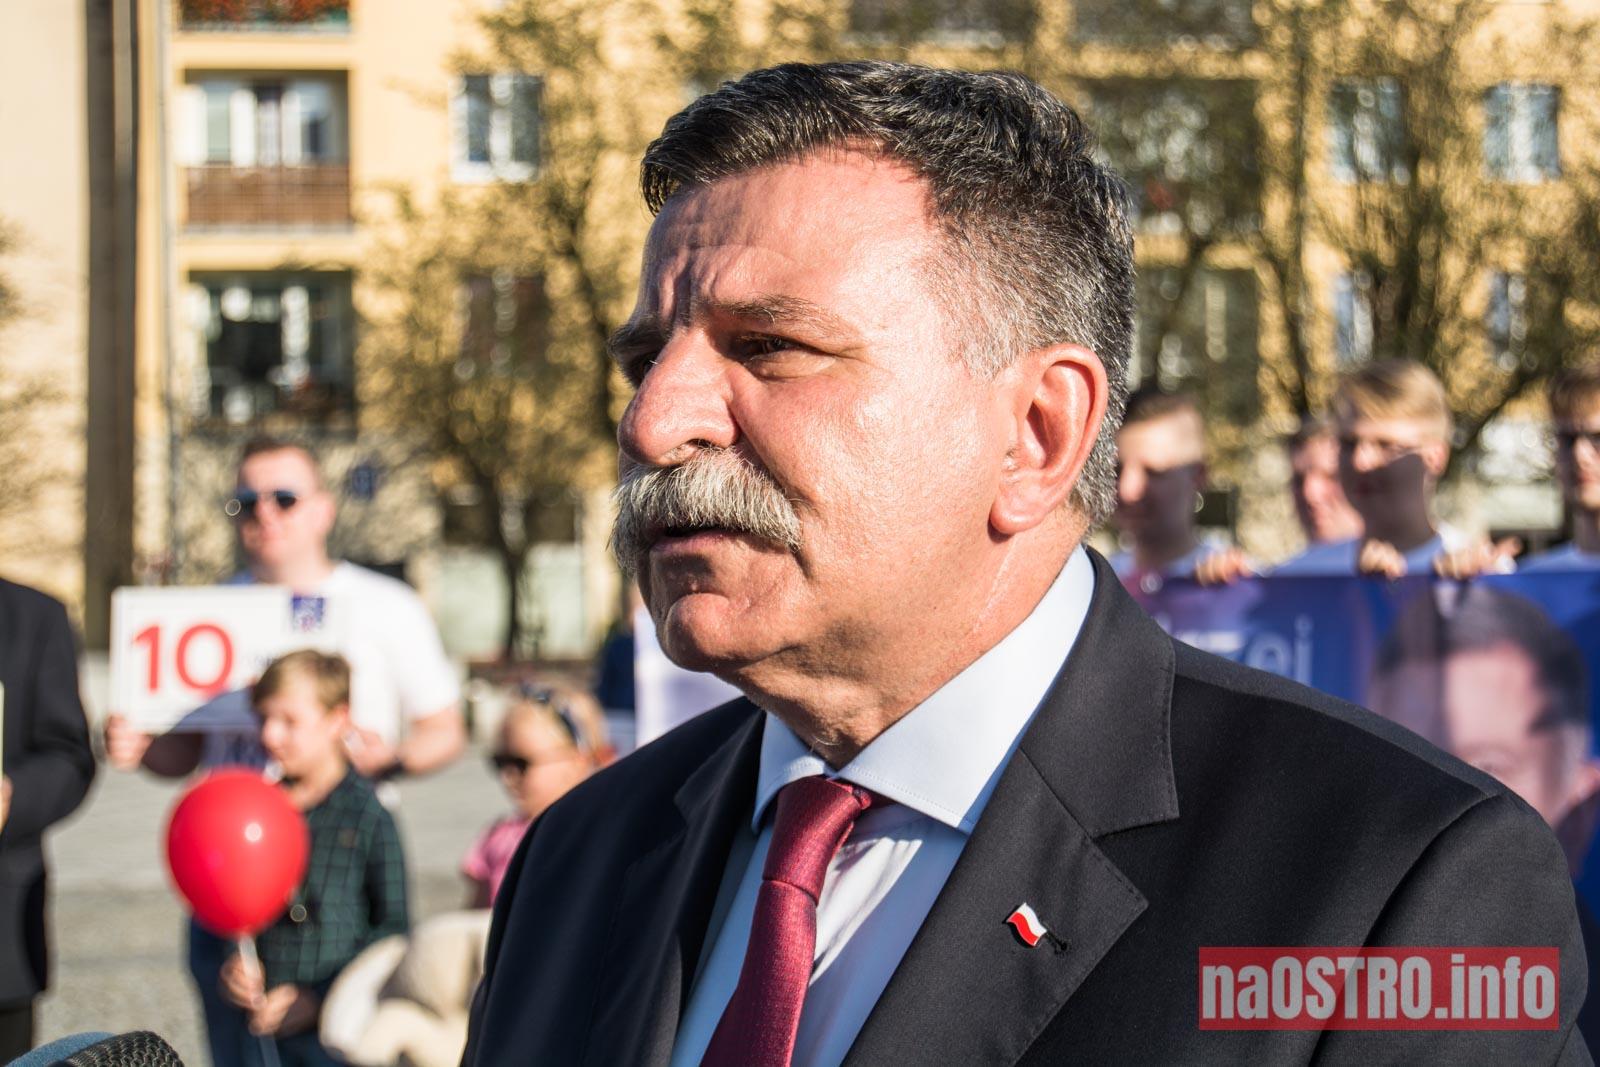 NaOSTRO Andrzej Kryj kampania-9